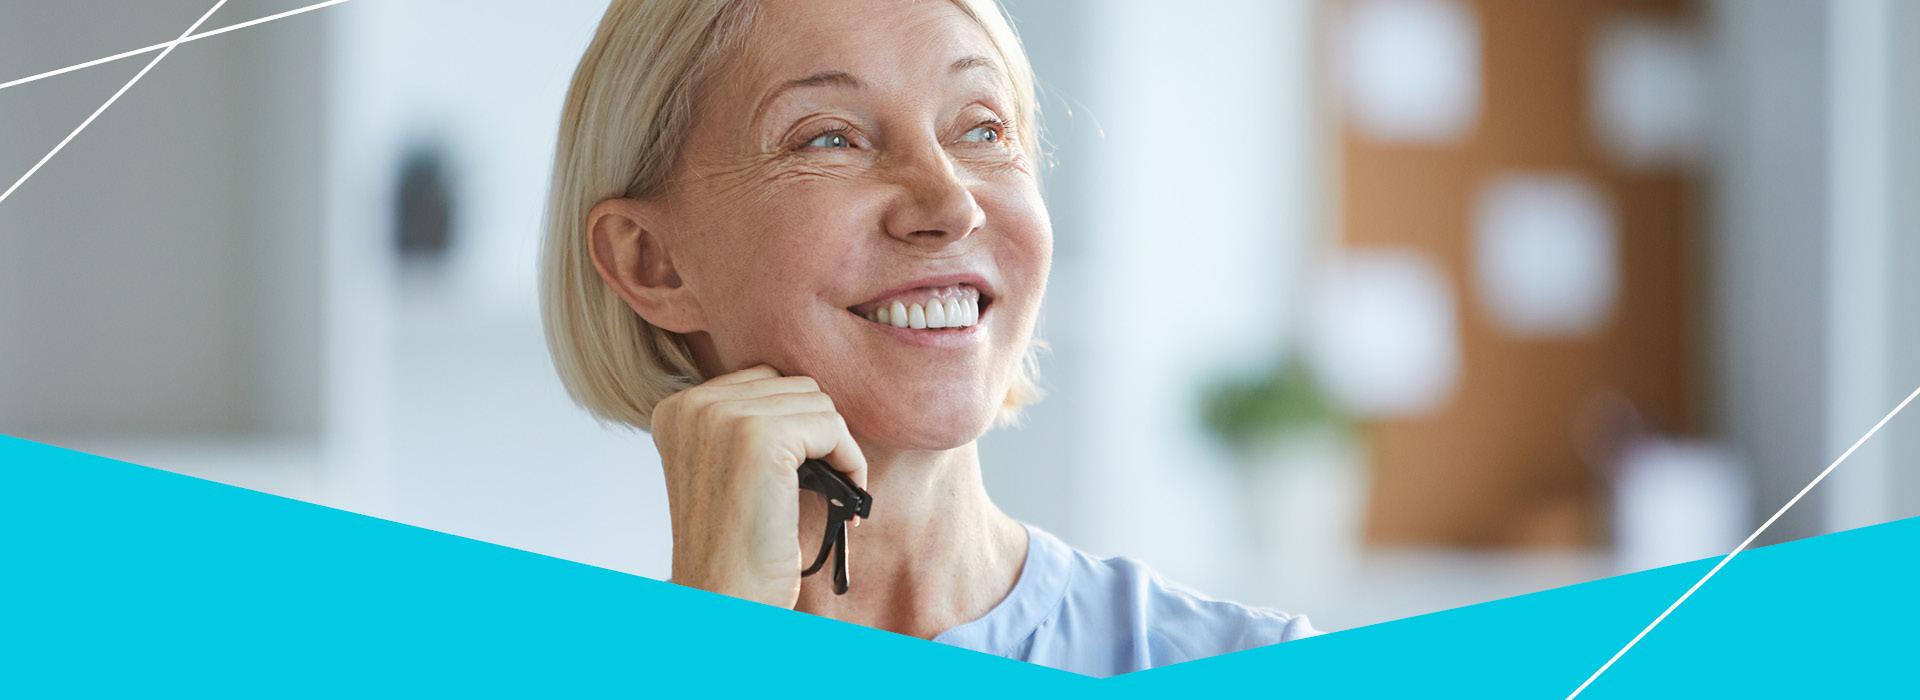 garda-odontoiatria-implantologia-carico-immediato2